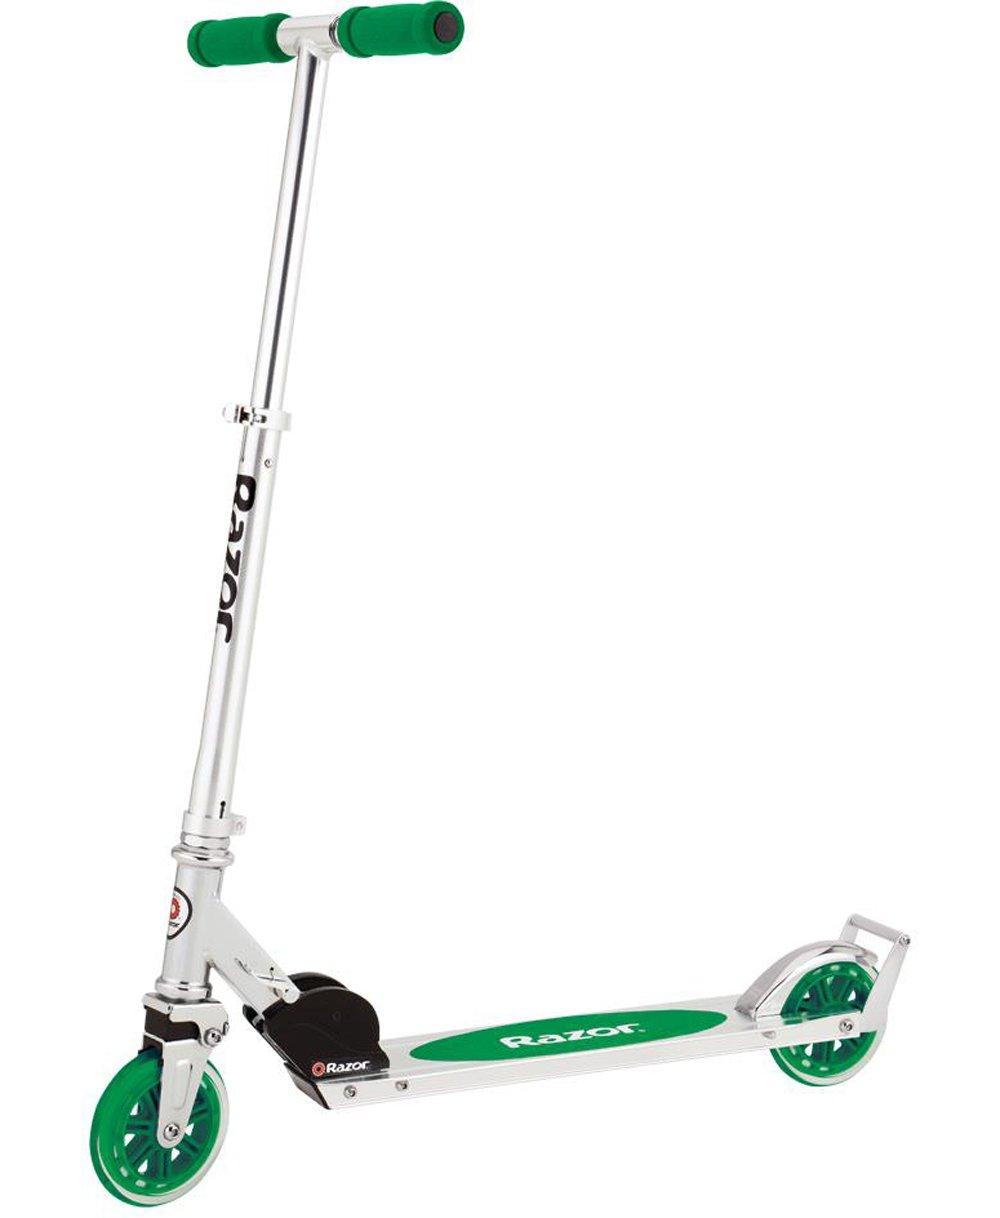 Razor A3 Kick Scooter (Green)